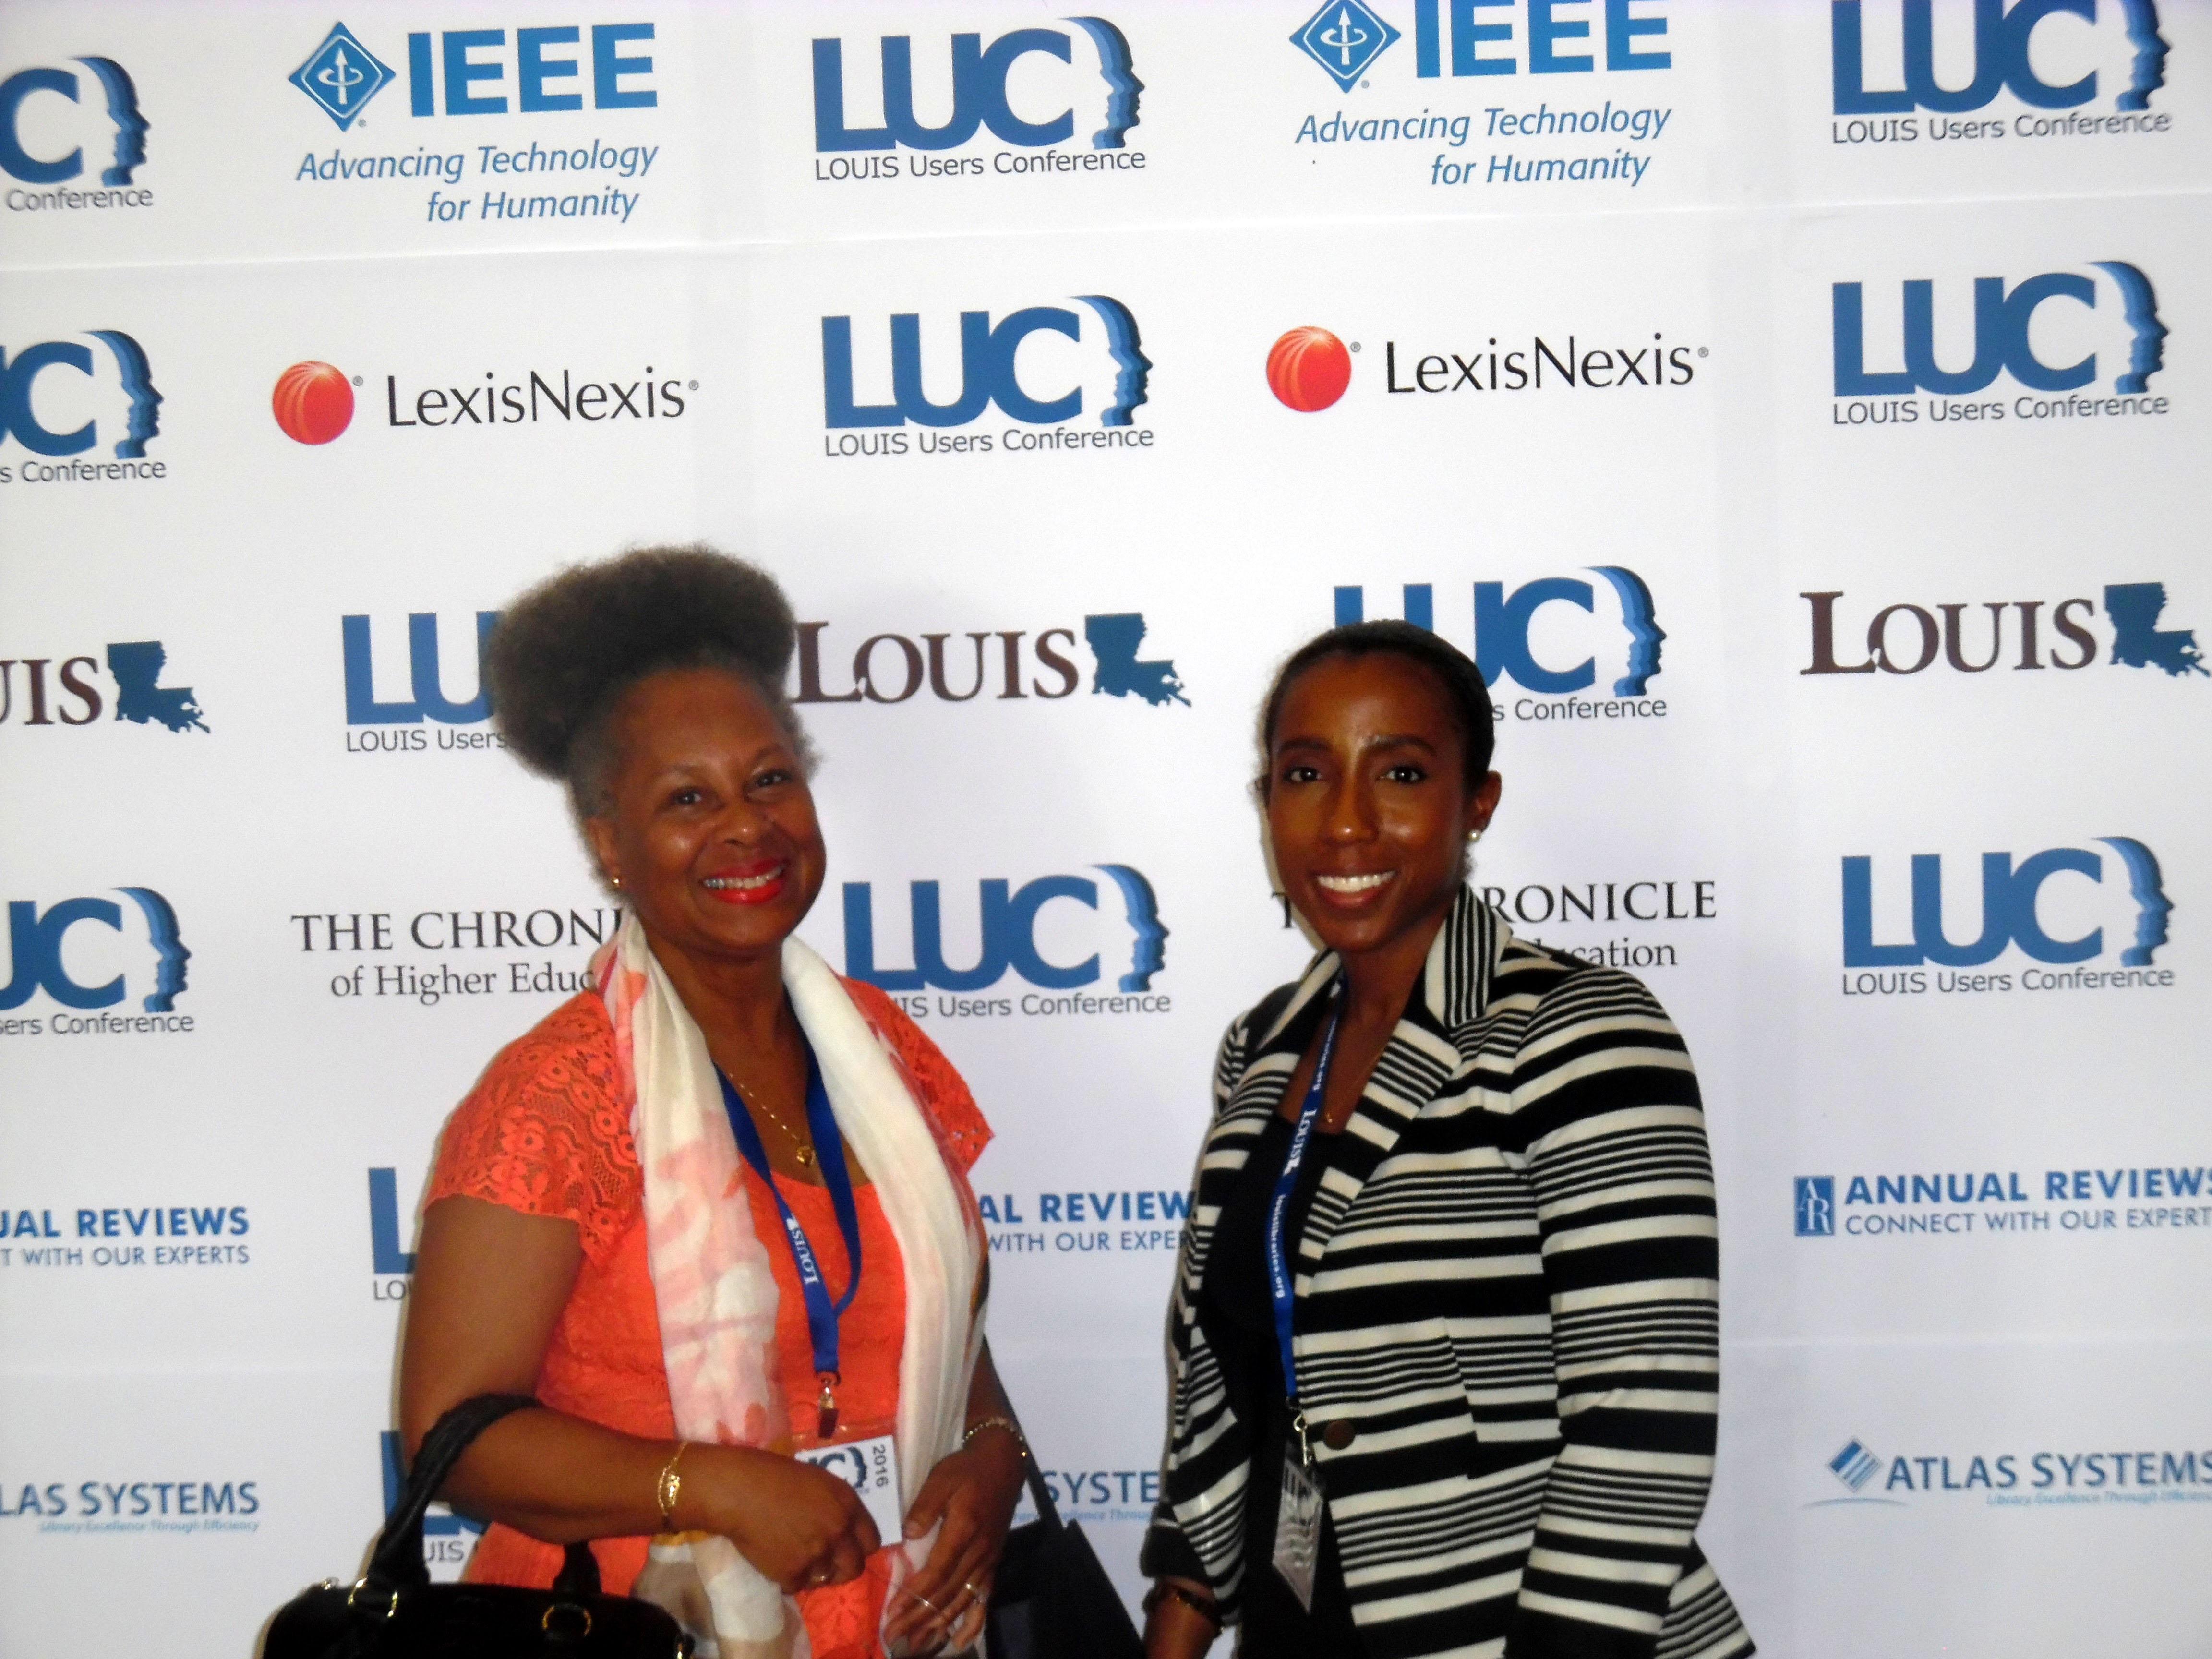 LUC 2016 - Past Conferences - LOUIS Libraries at LOUIS (The